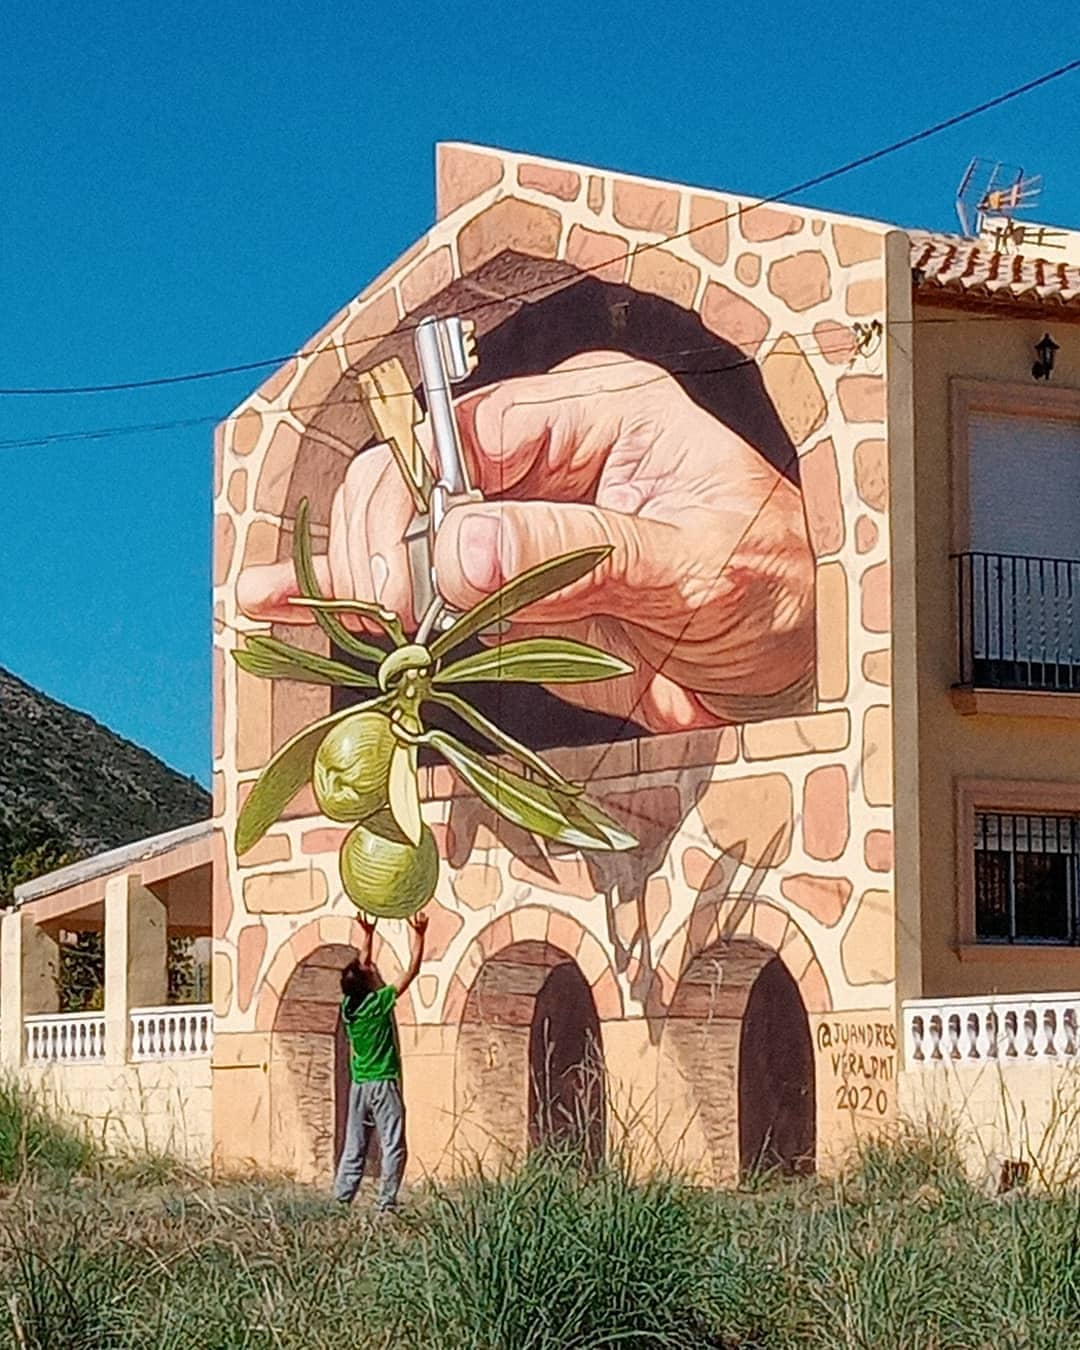 Juandres Vera @ Benichembla, Spain